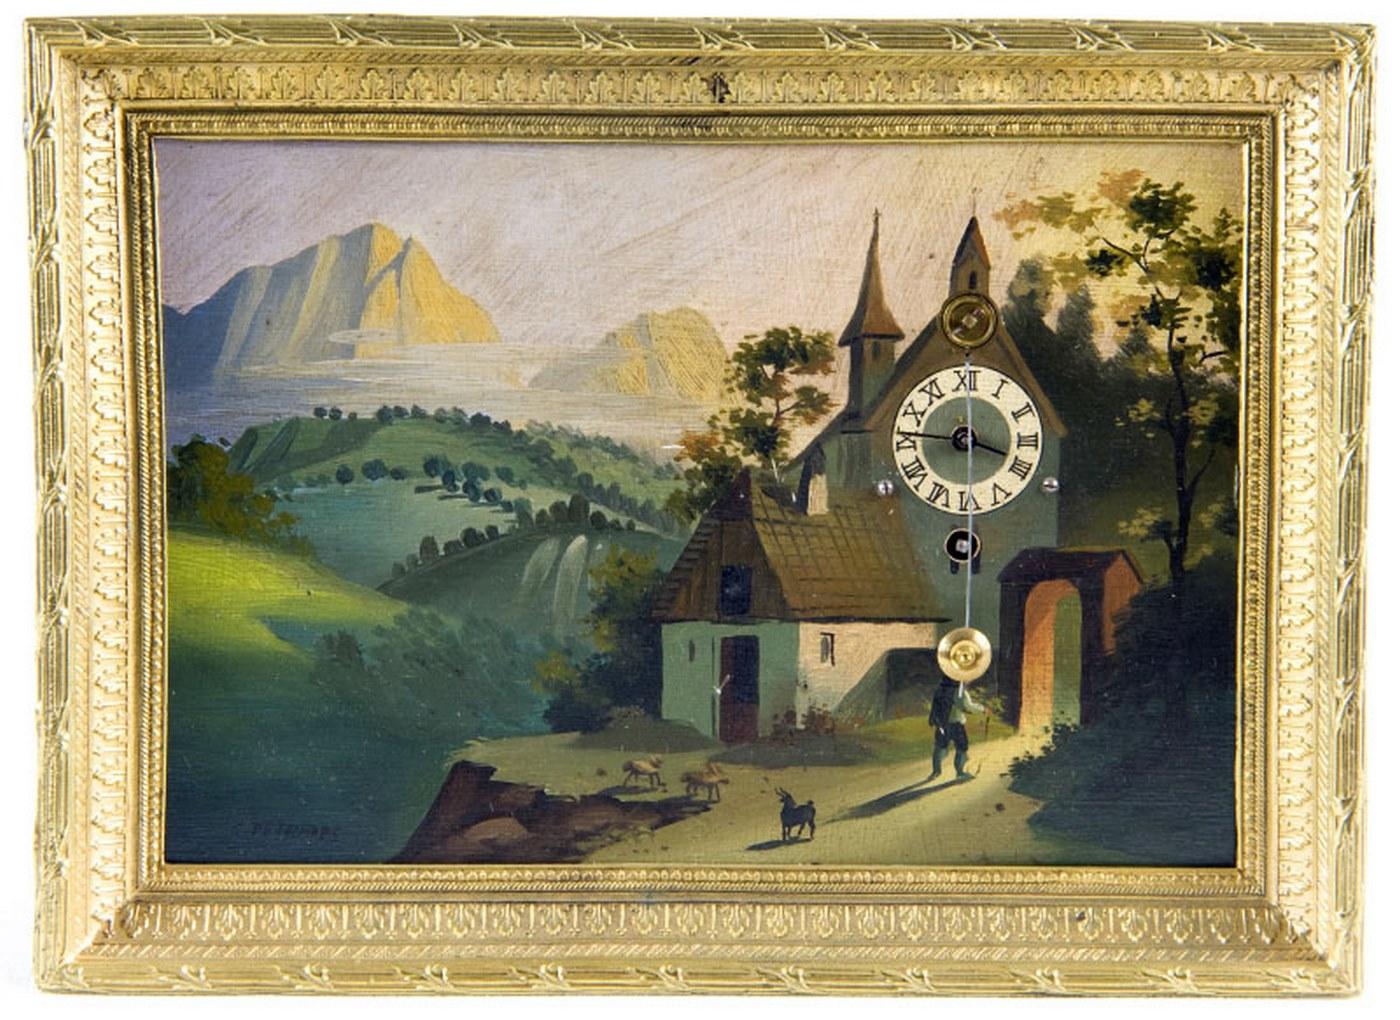 Reloj de Sobremesa, integrado en óleo sobre placa de cobre. Manufactura Austriaco. Siglo XIX